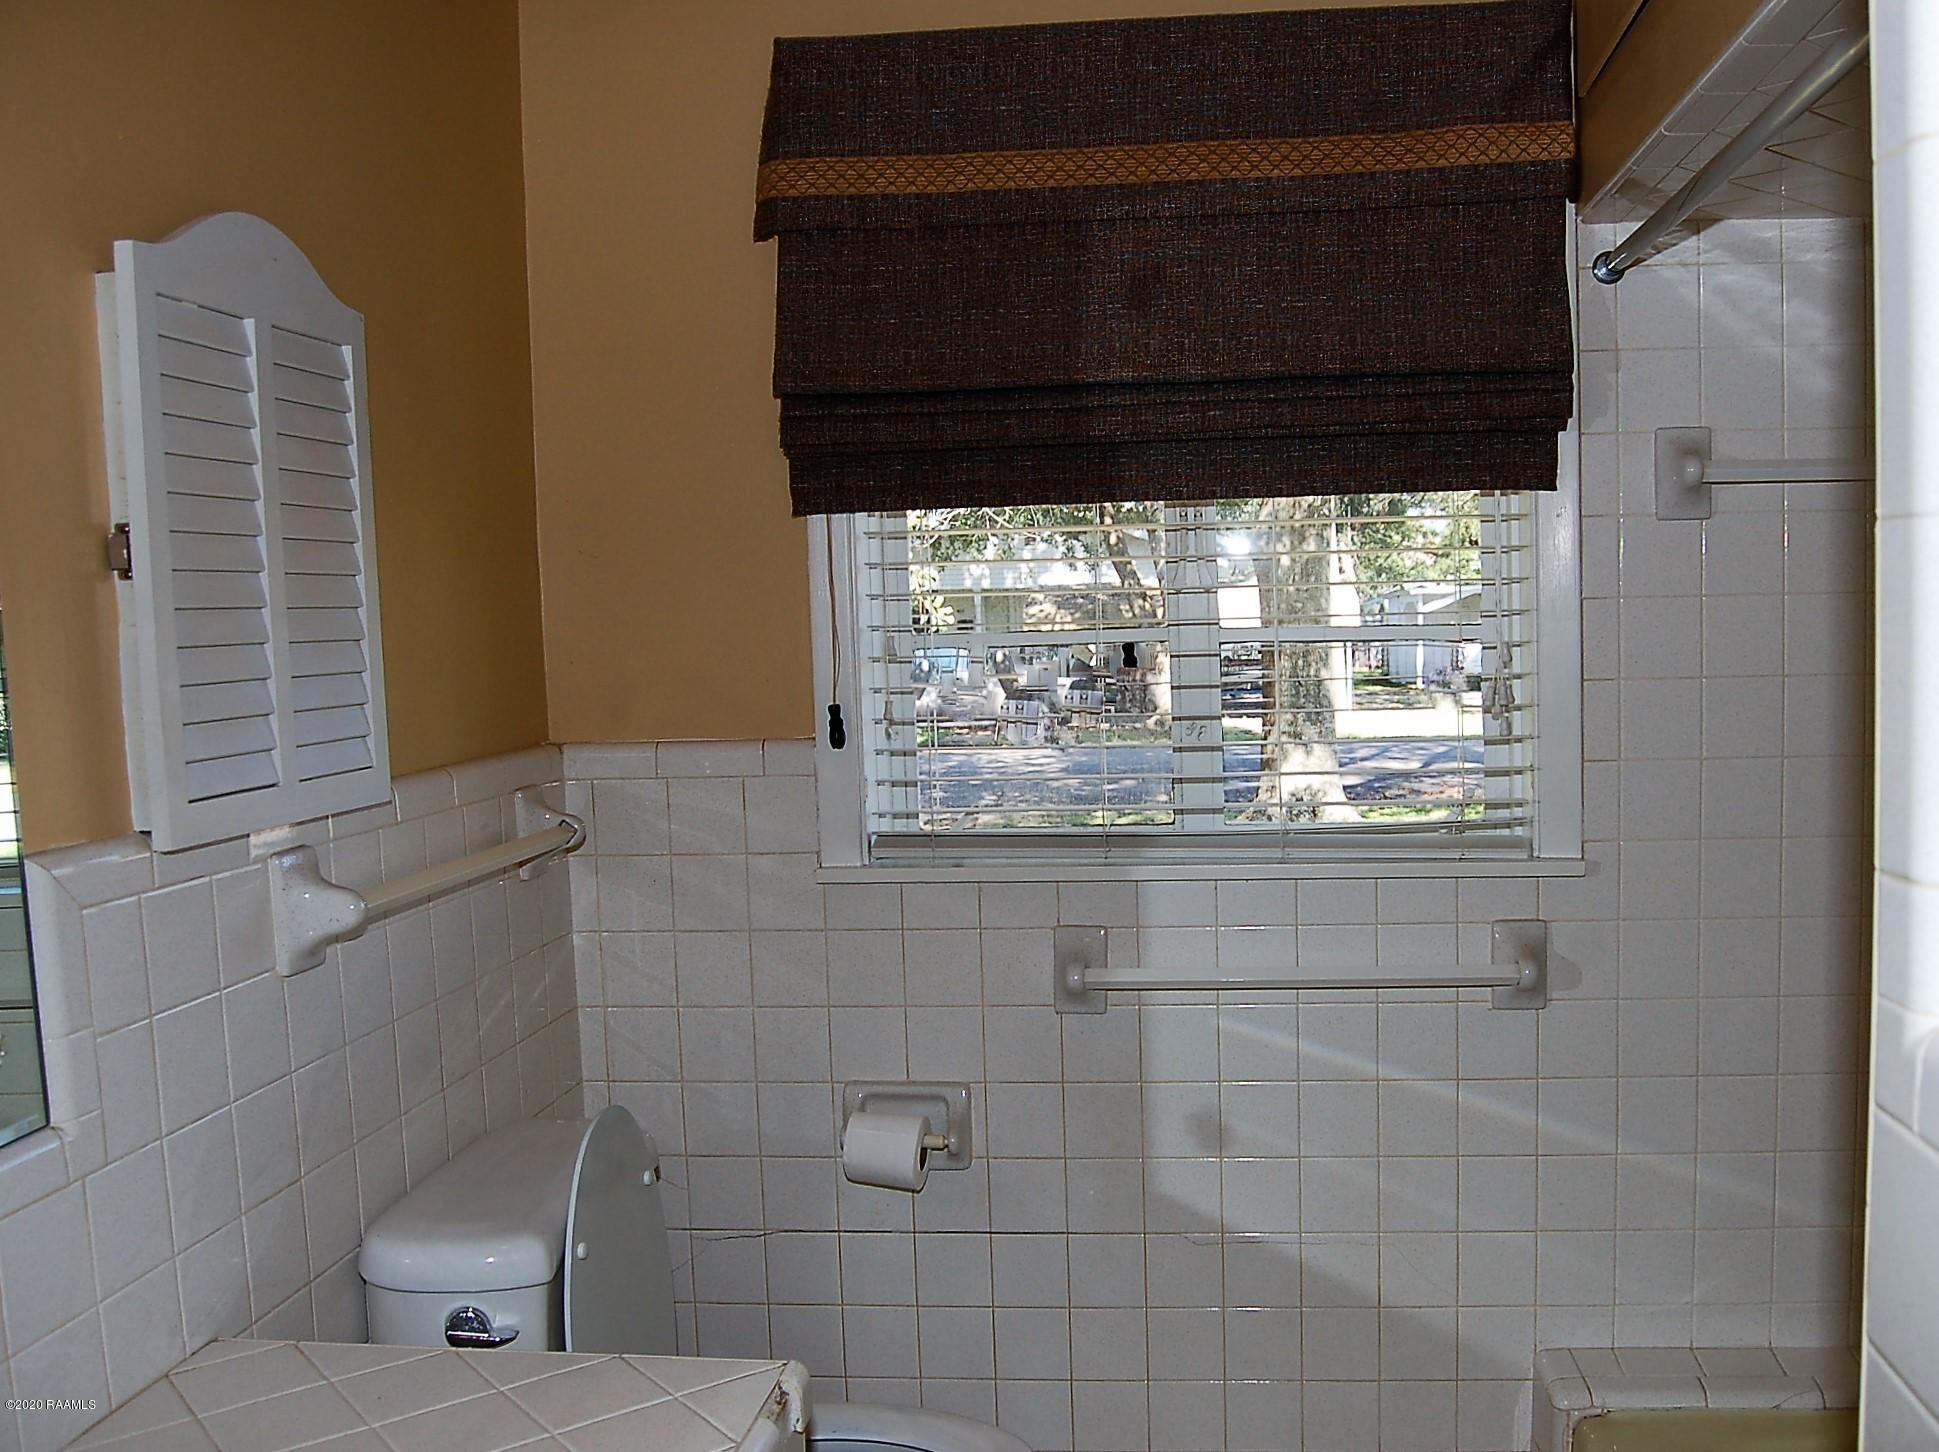 923 Ave J N, Crowley, LA 70526 Photo #20